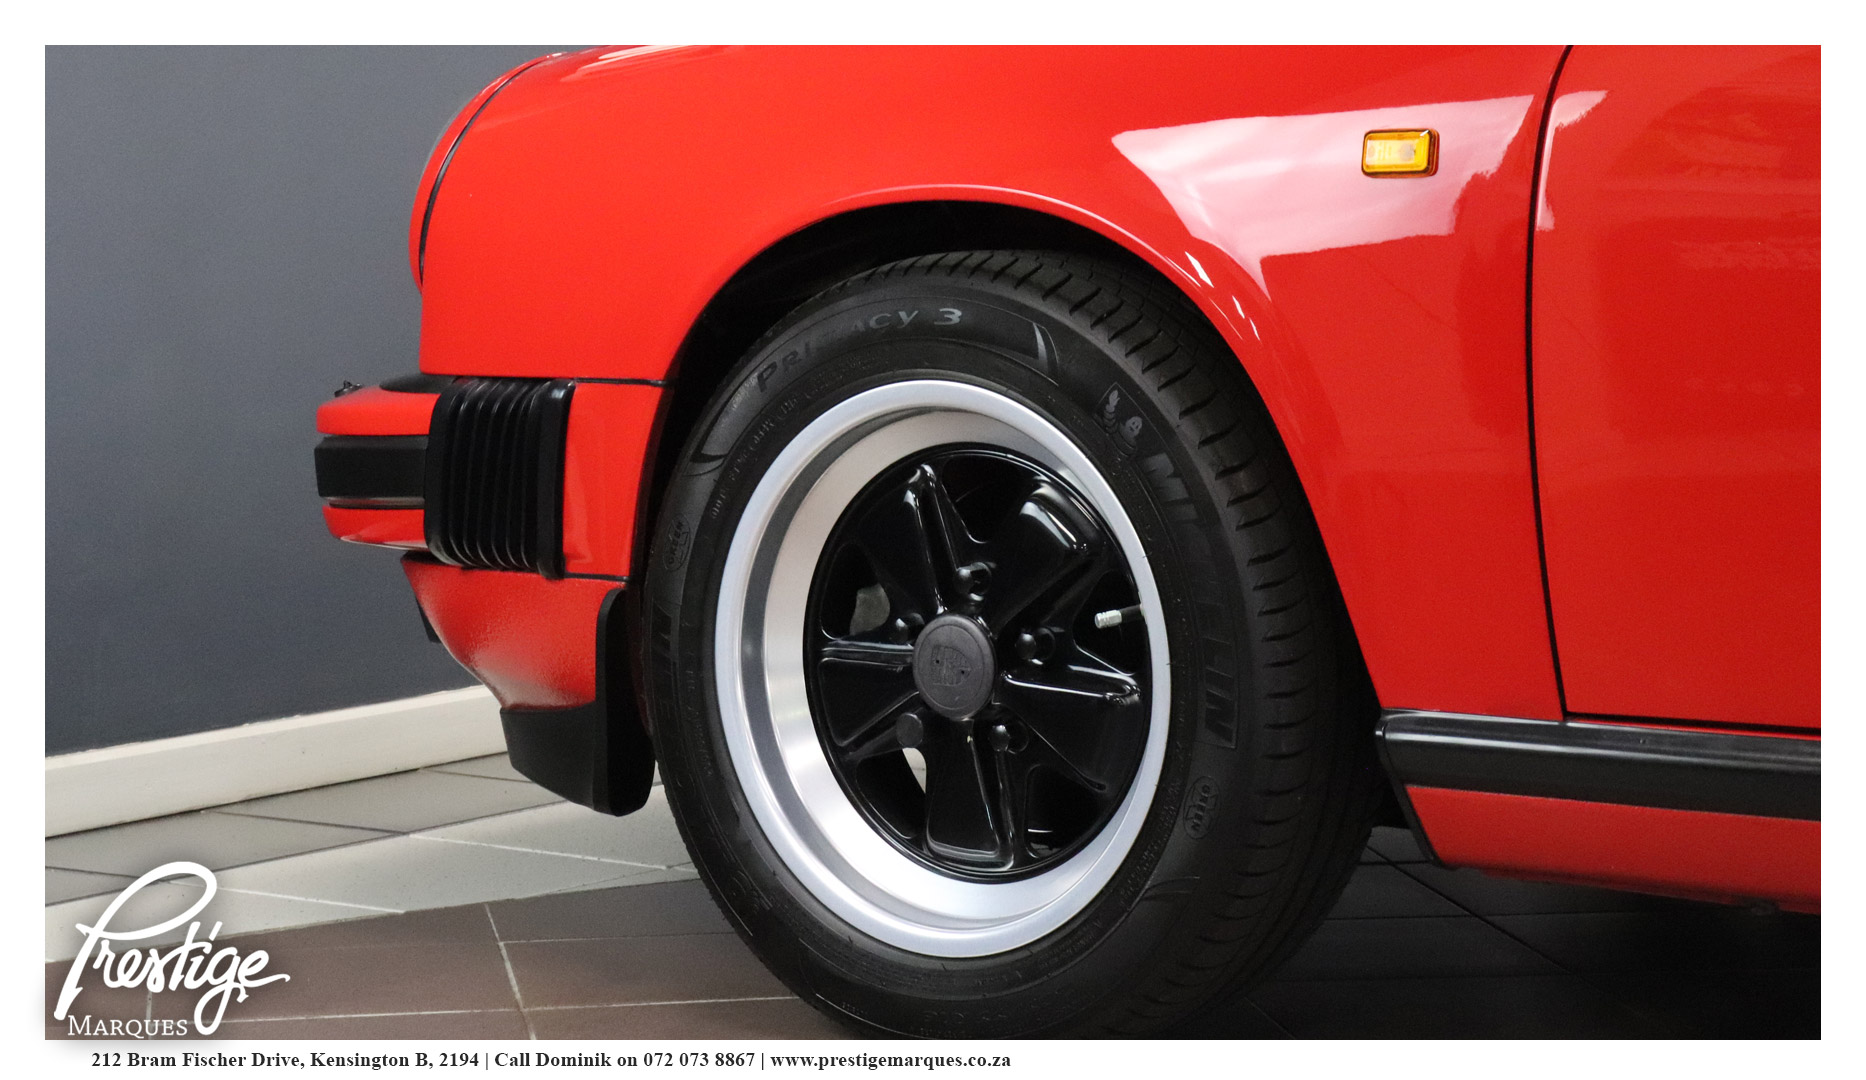 1989-Porsche-911-Carerra-3.2-350-Prestige-Marques-Randburg-Sandton-11